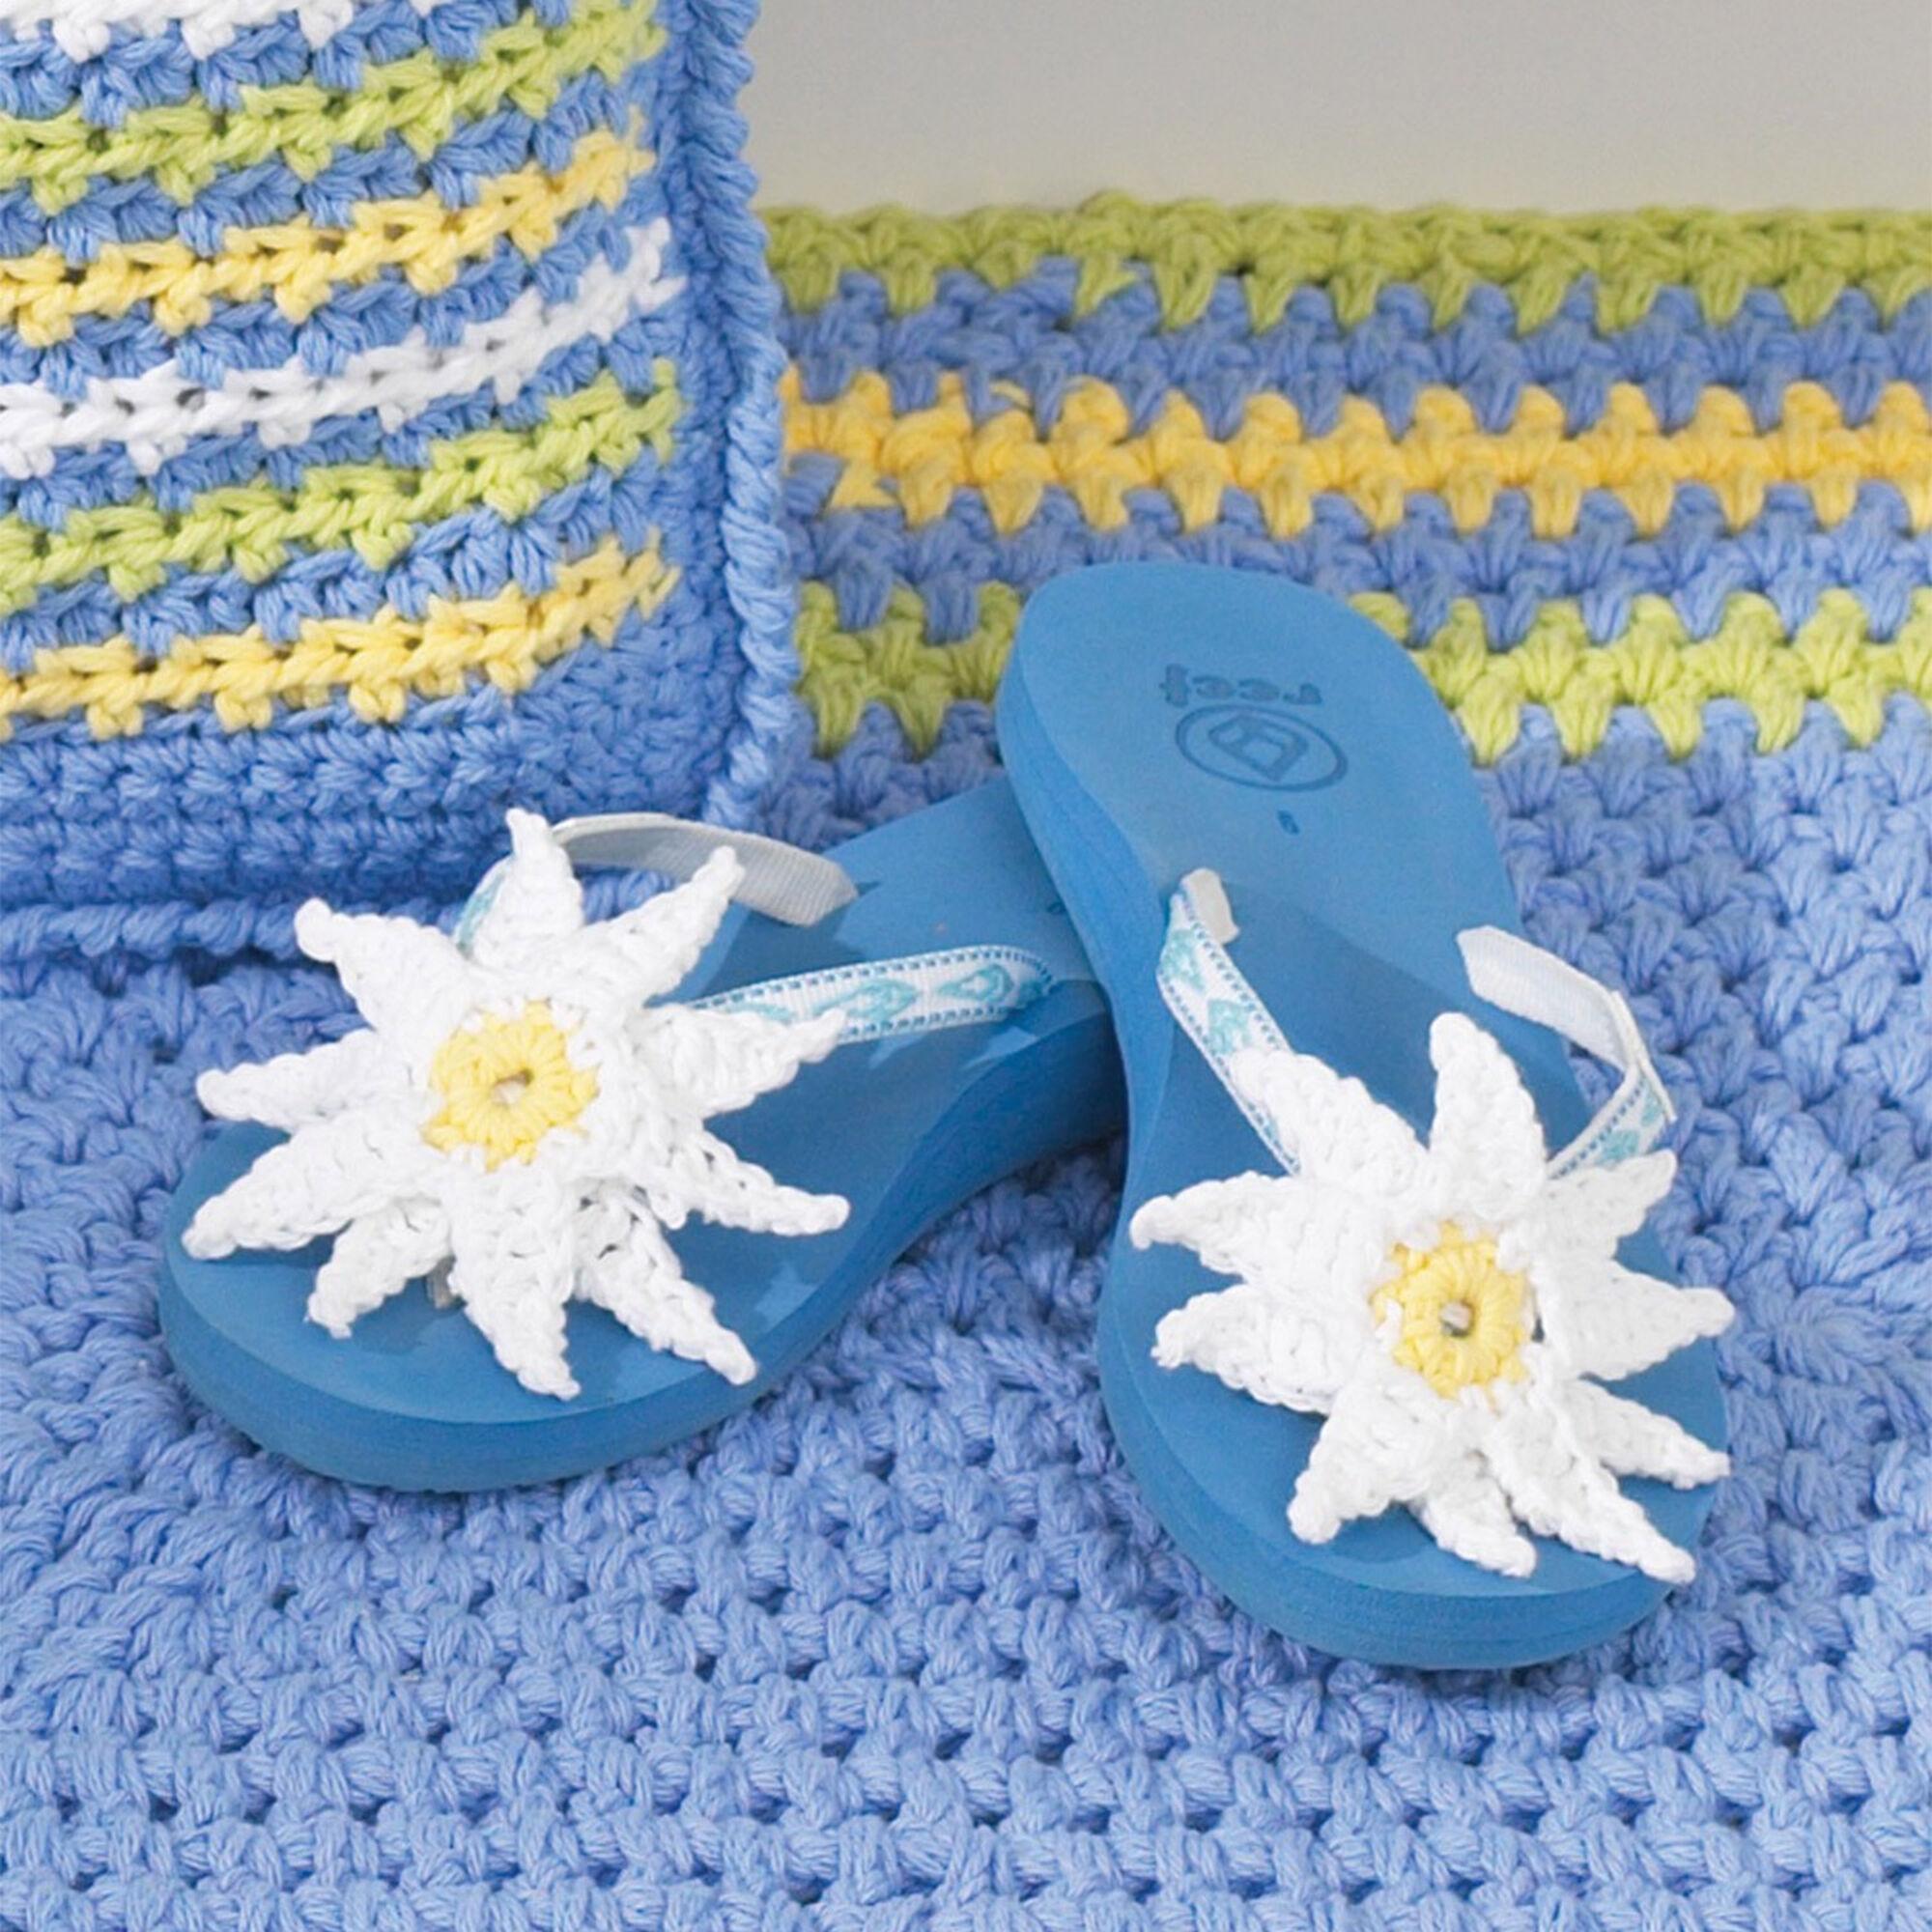 Bernat Flip Flops With Daisies Pattern  7e3d0ce39